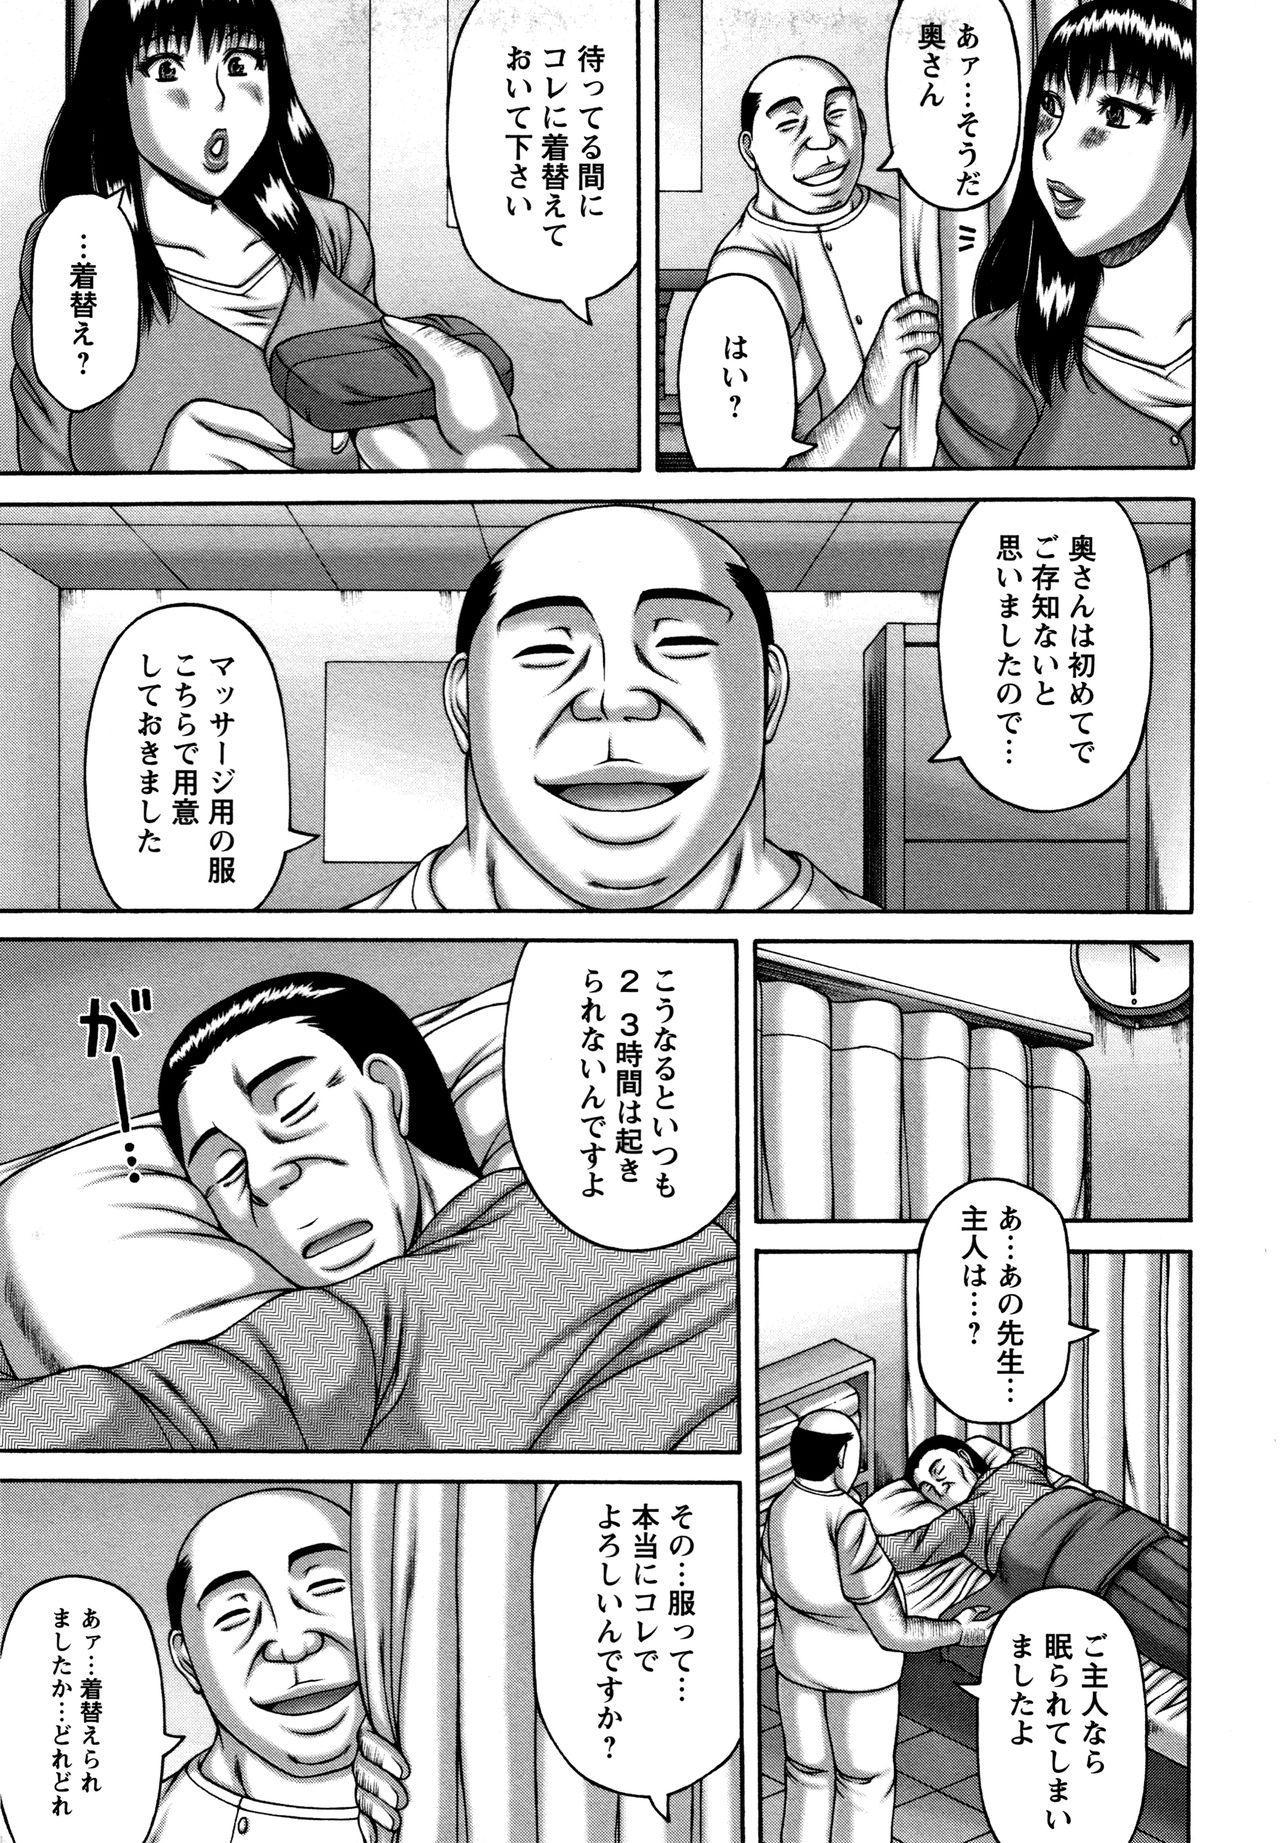 Tsuma no Netorare Kinenbi - My Wife NTR Memorial Day 7